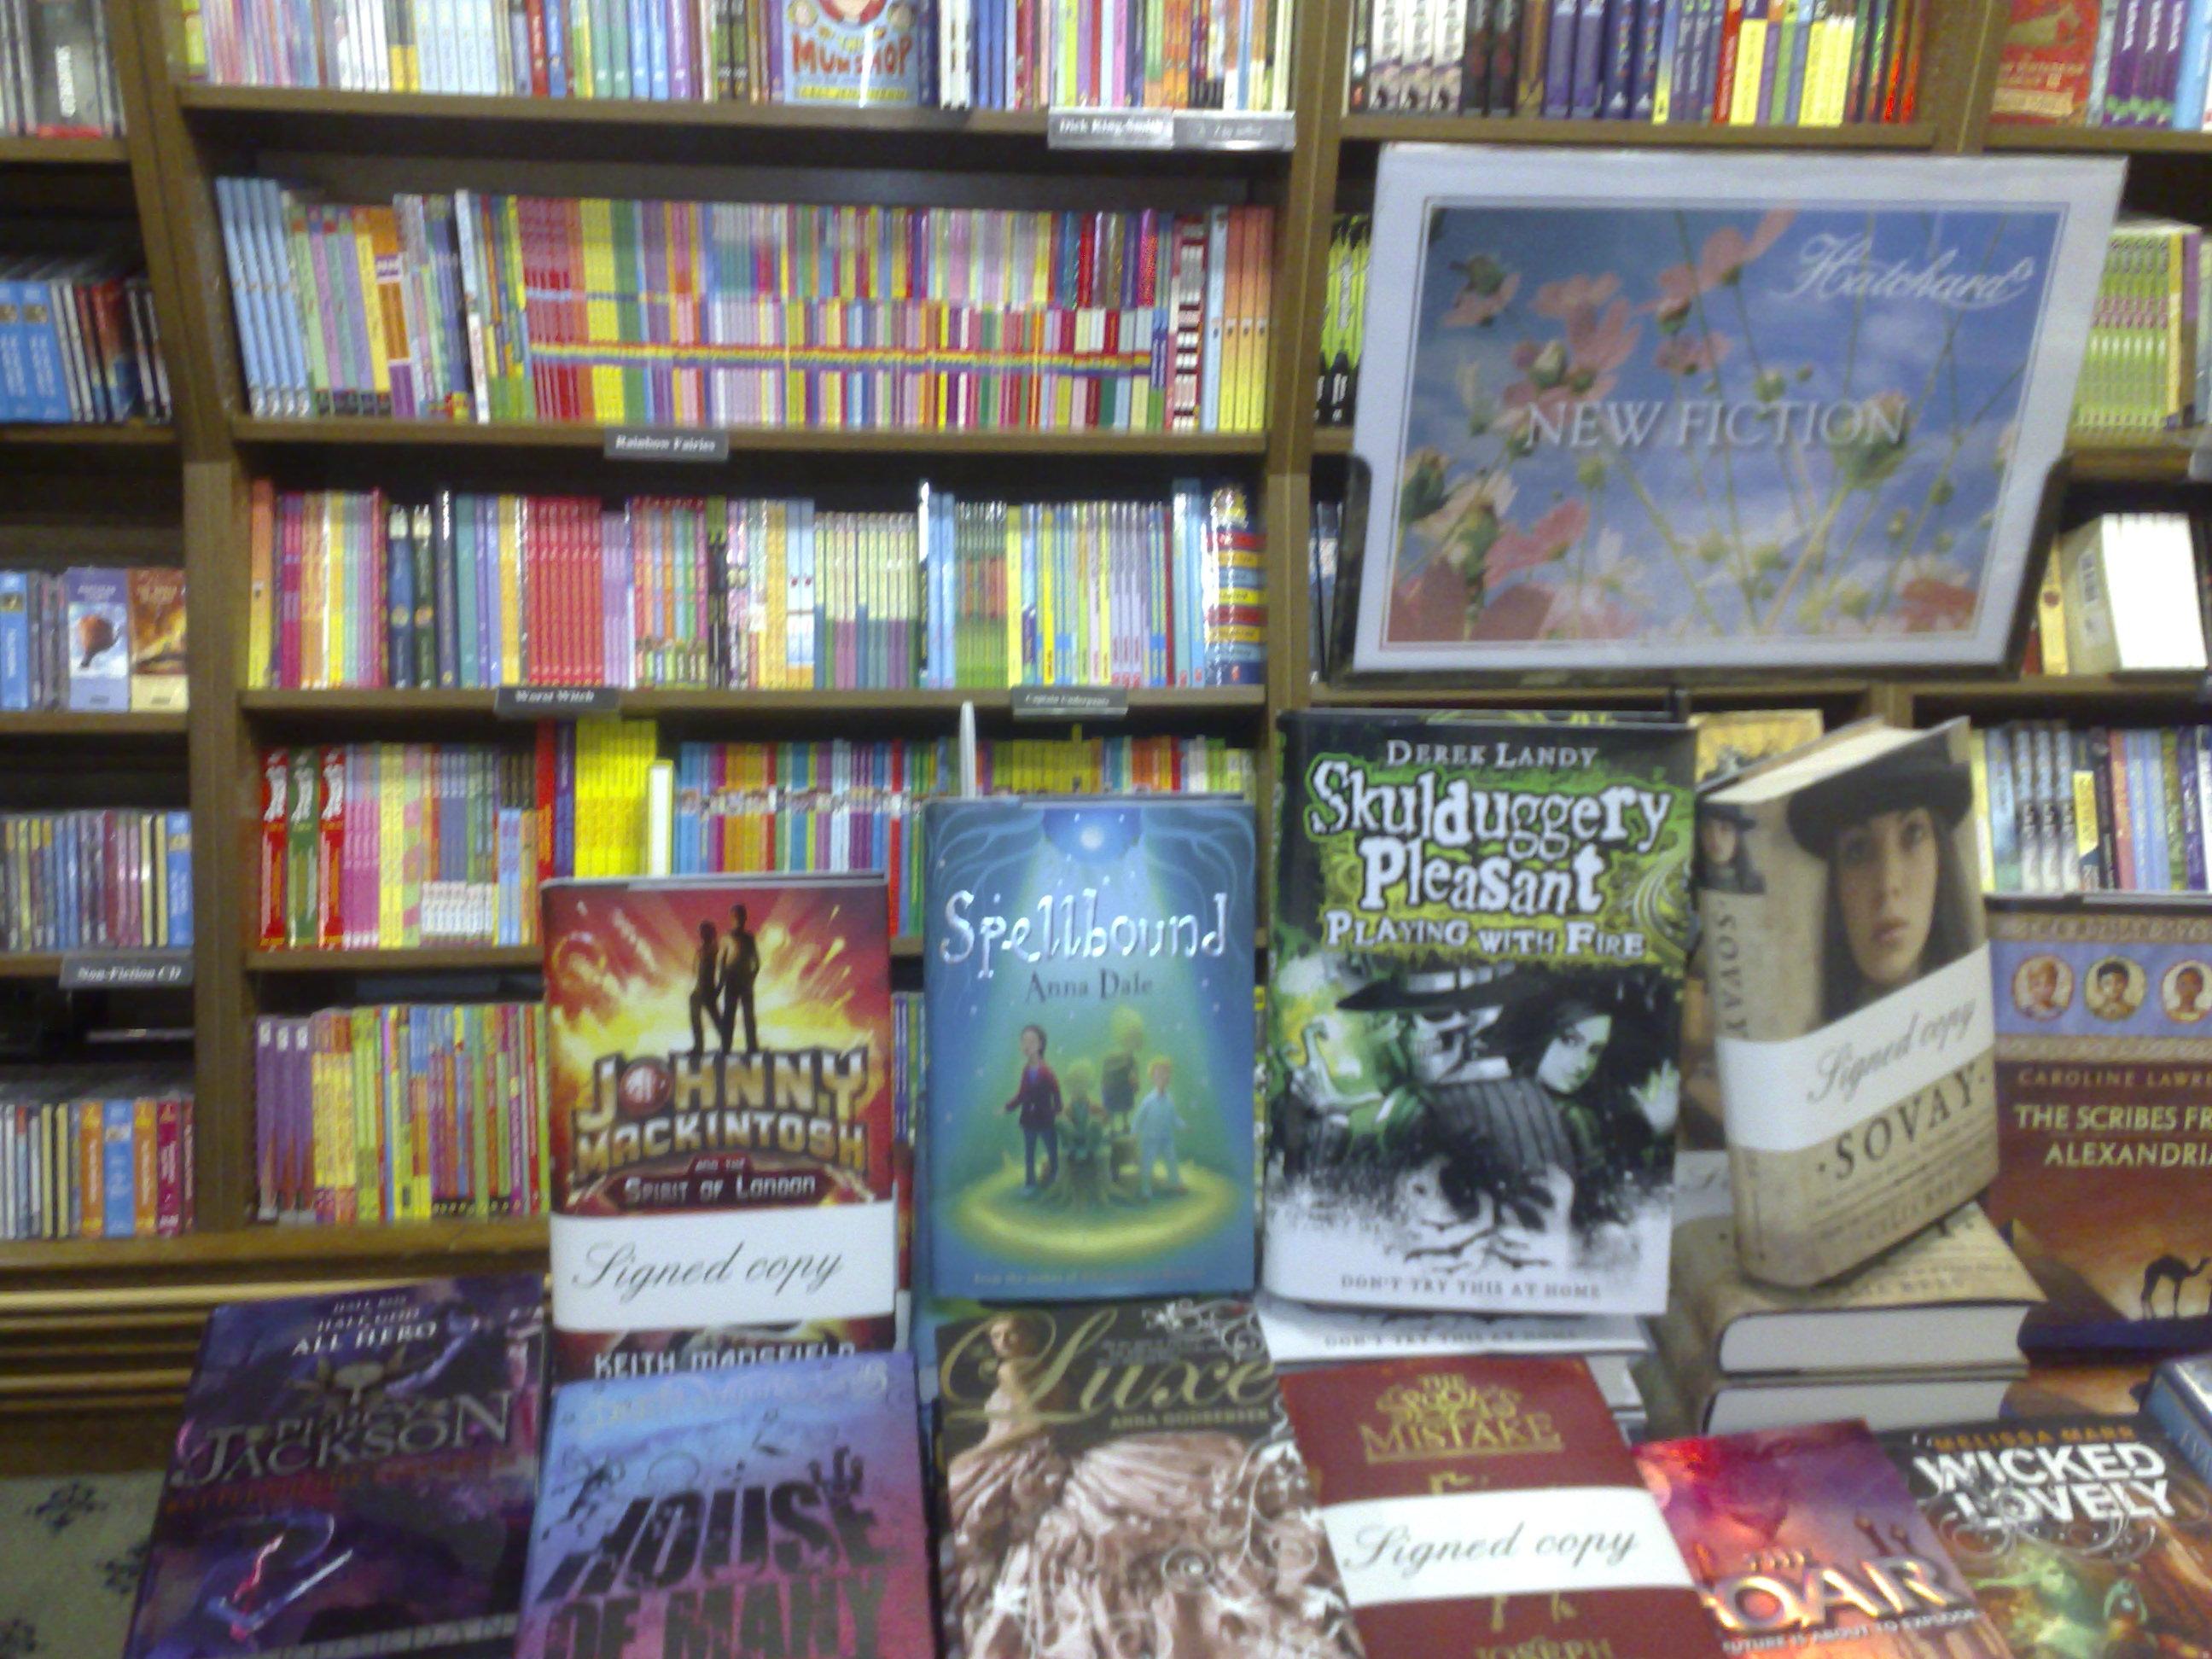 Hatchards new fiction display